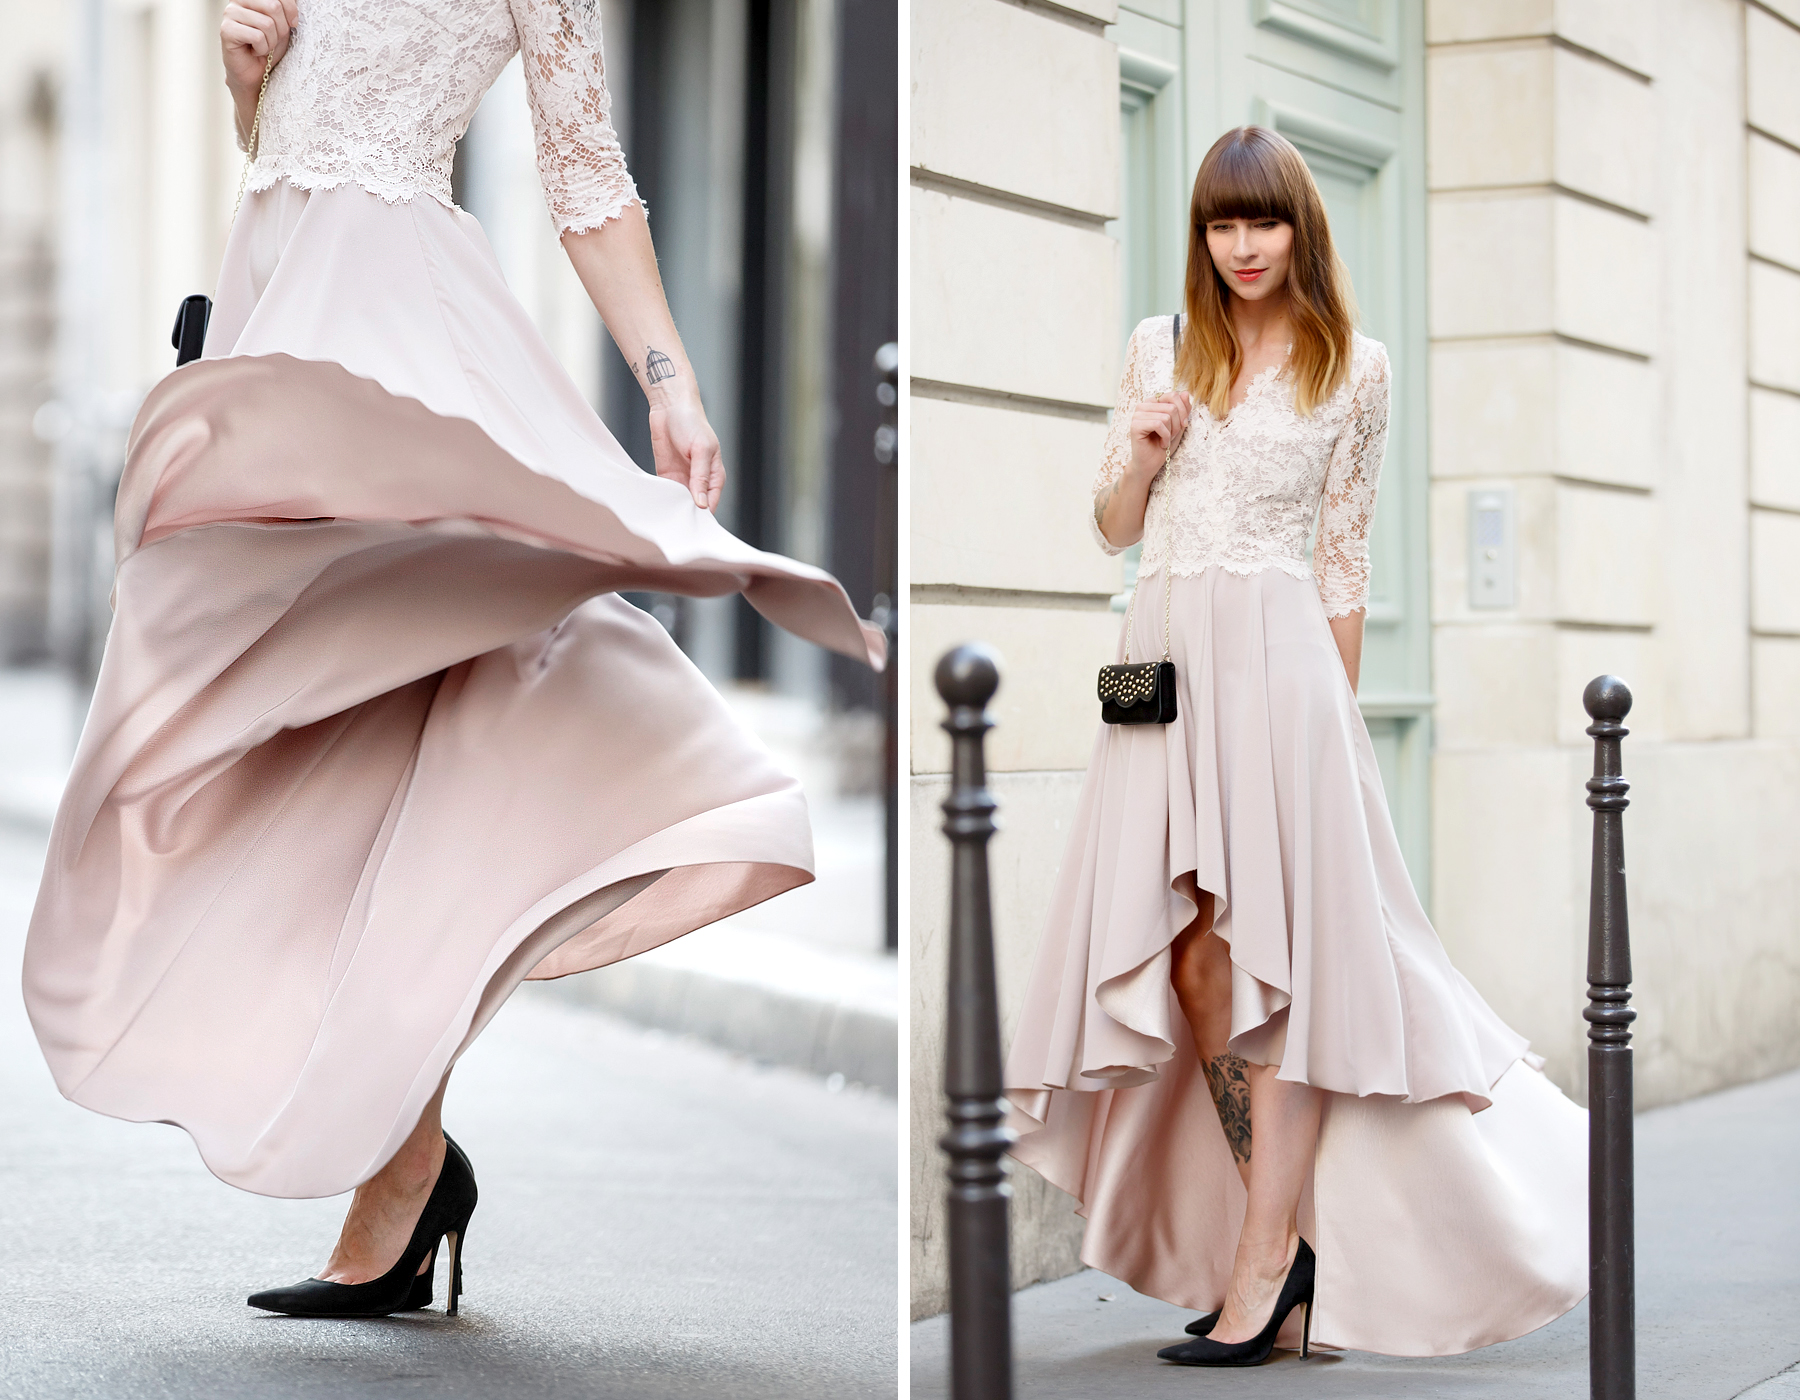 ewa herzog lace dress pastel rose paris le marais pfw fashion week ss16 ricarda schernus cats & dogs blog 3